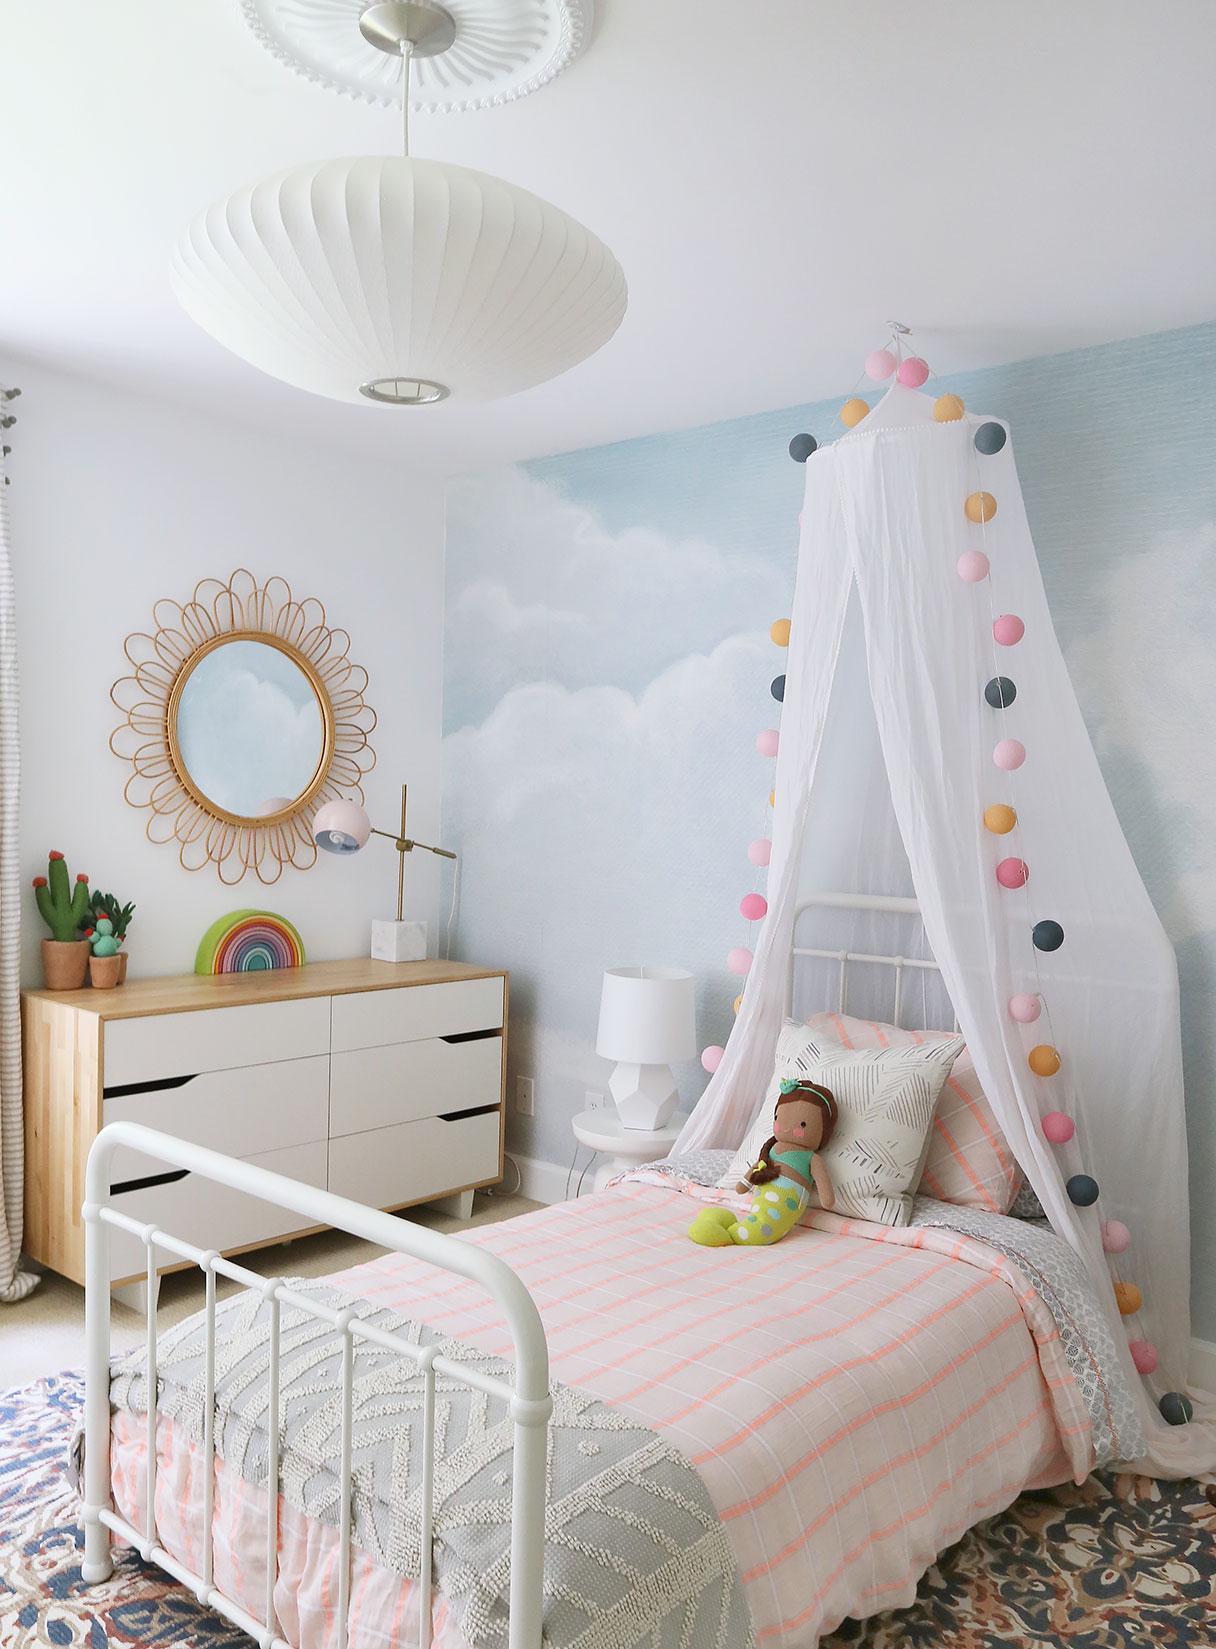 zora-bedroom-6-blog.jpg